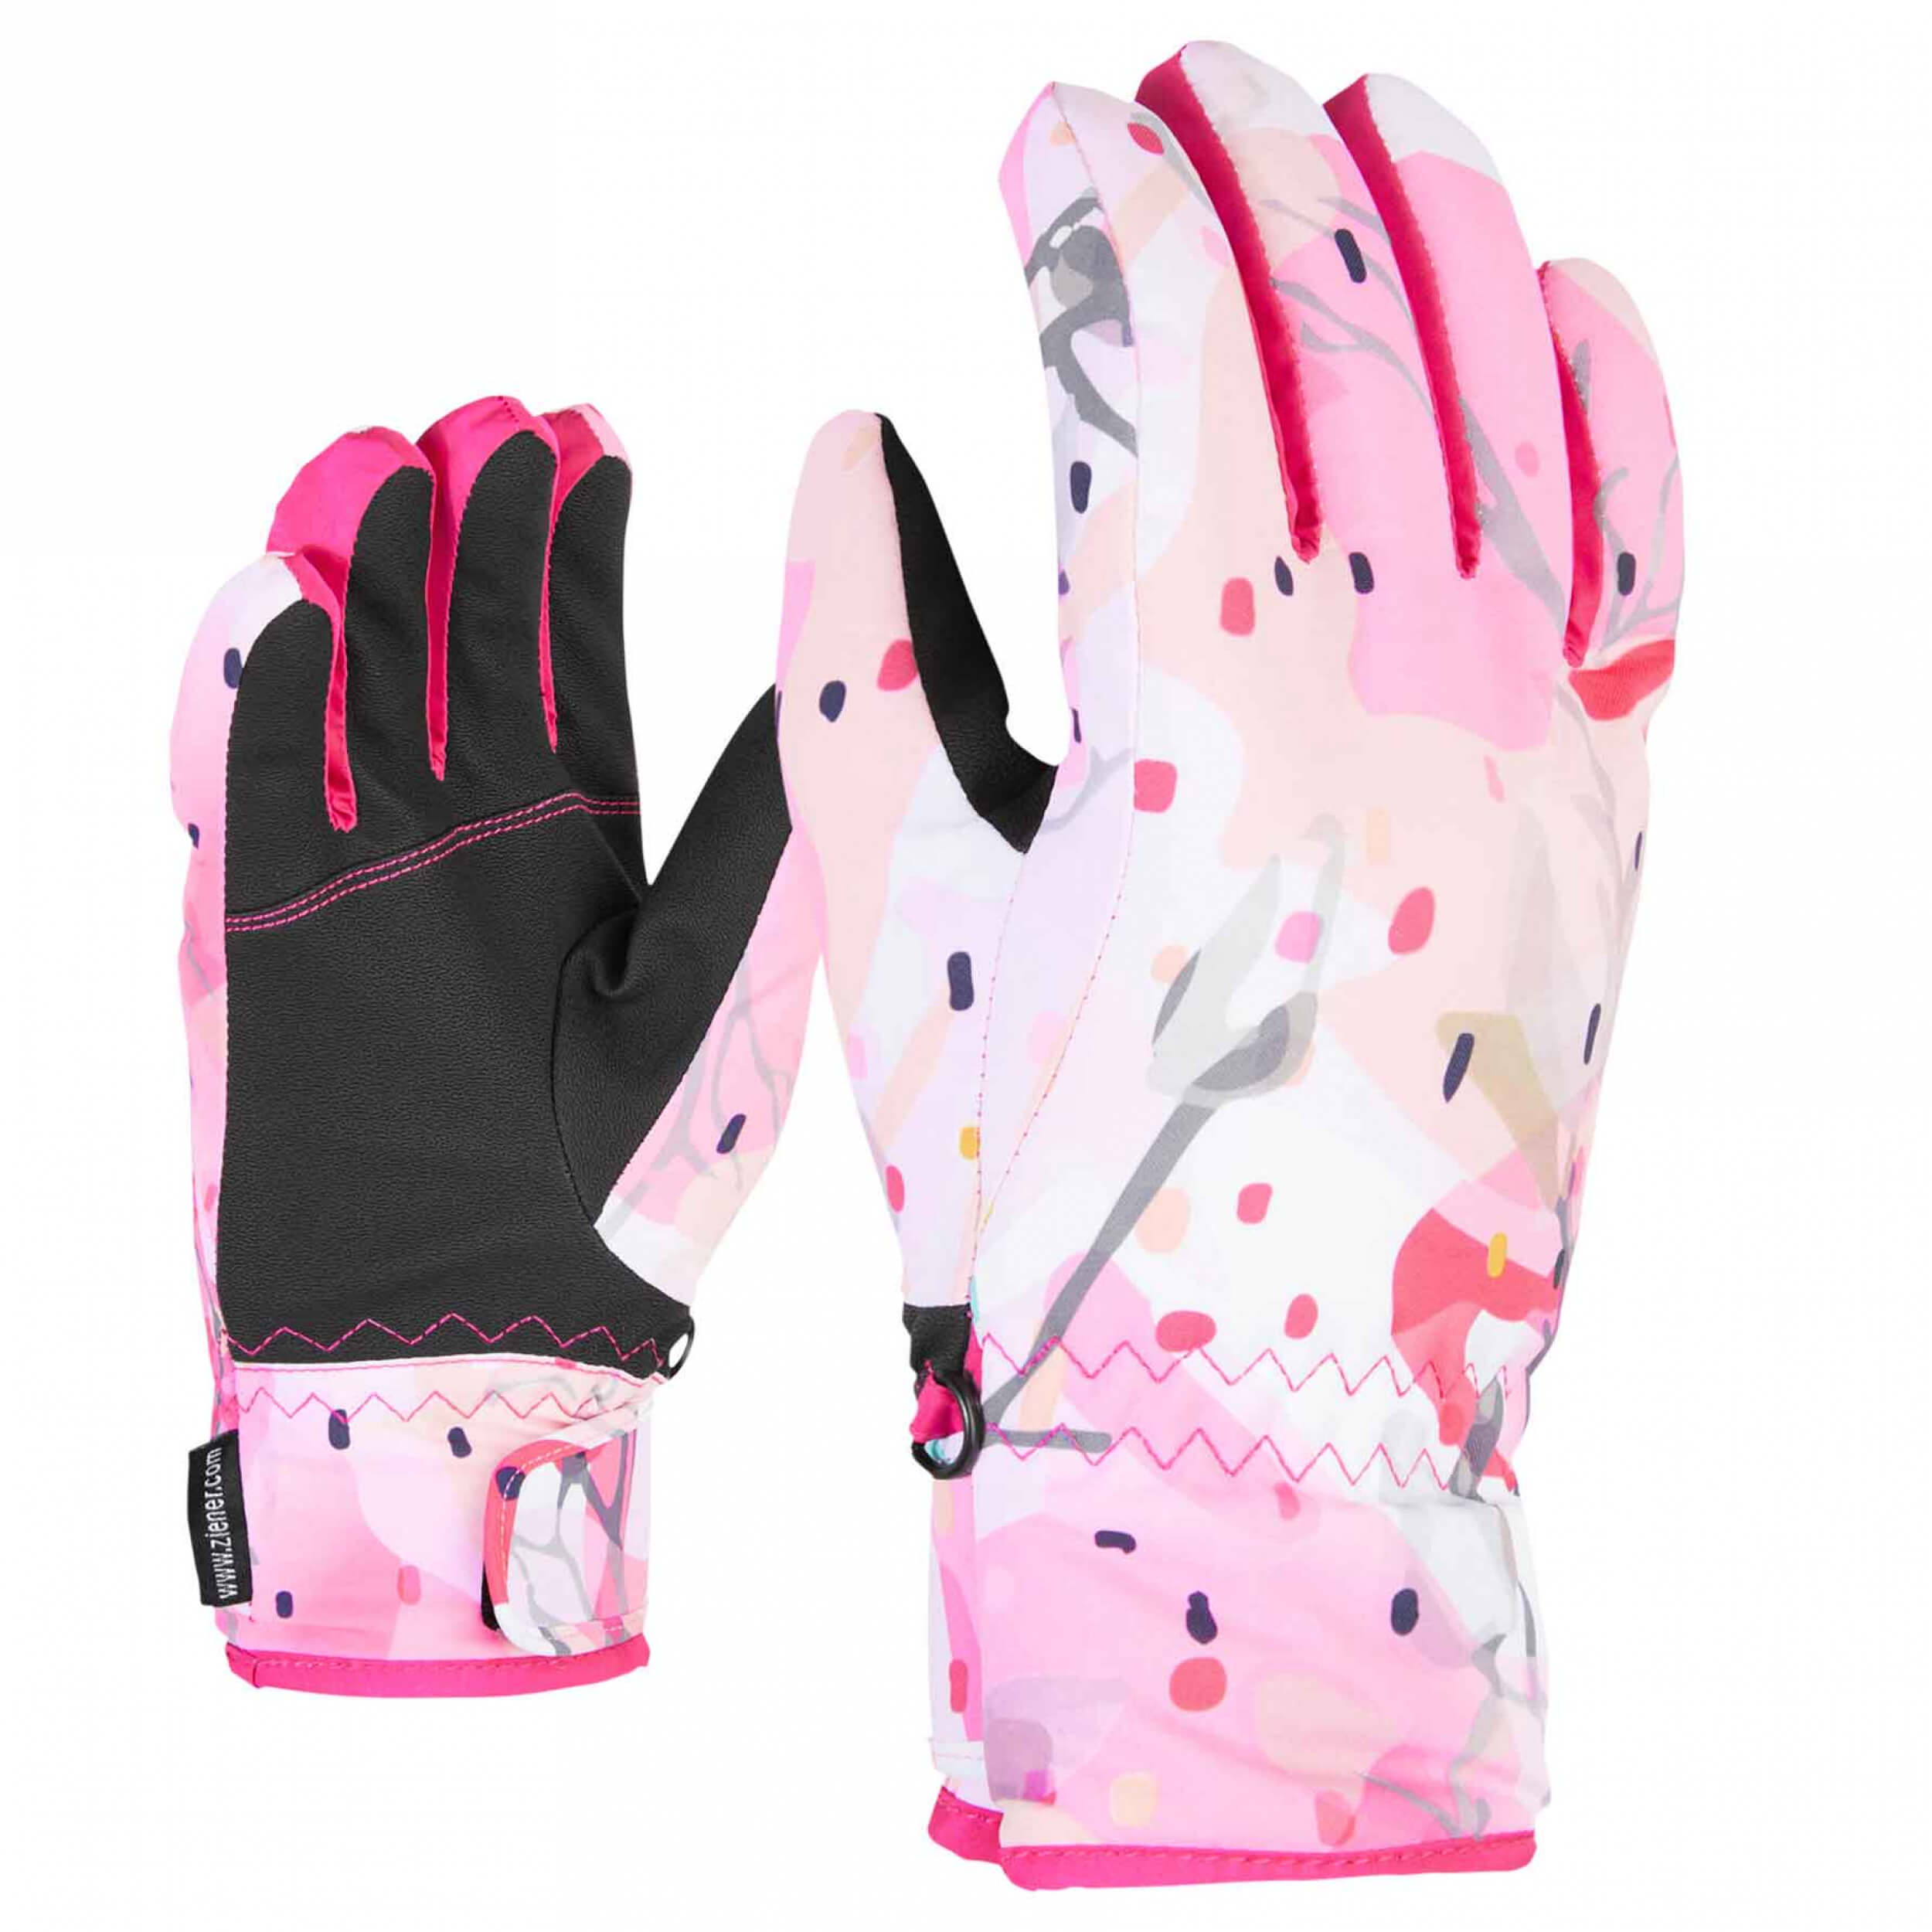 ZIENER Kinder Ski-Handschuhe Luffi AQUASHIELD pink 885